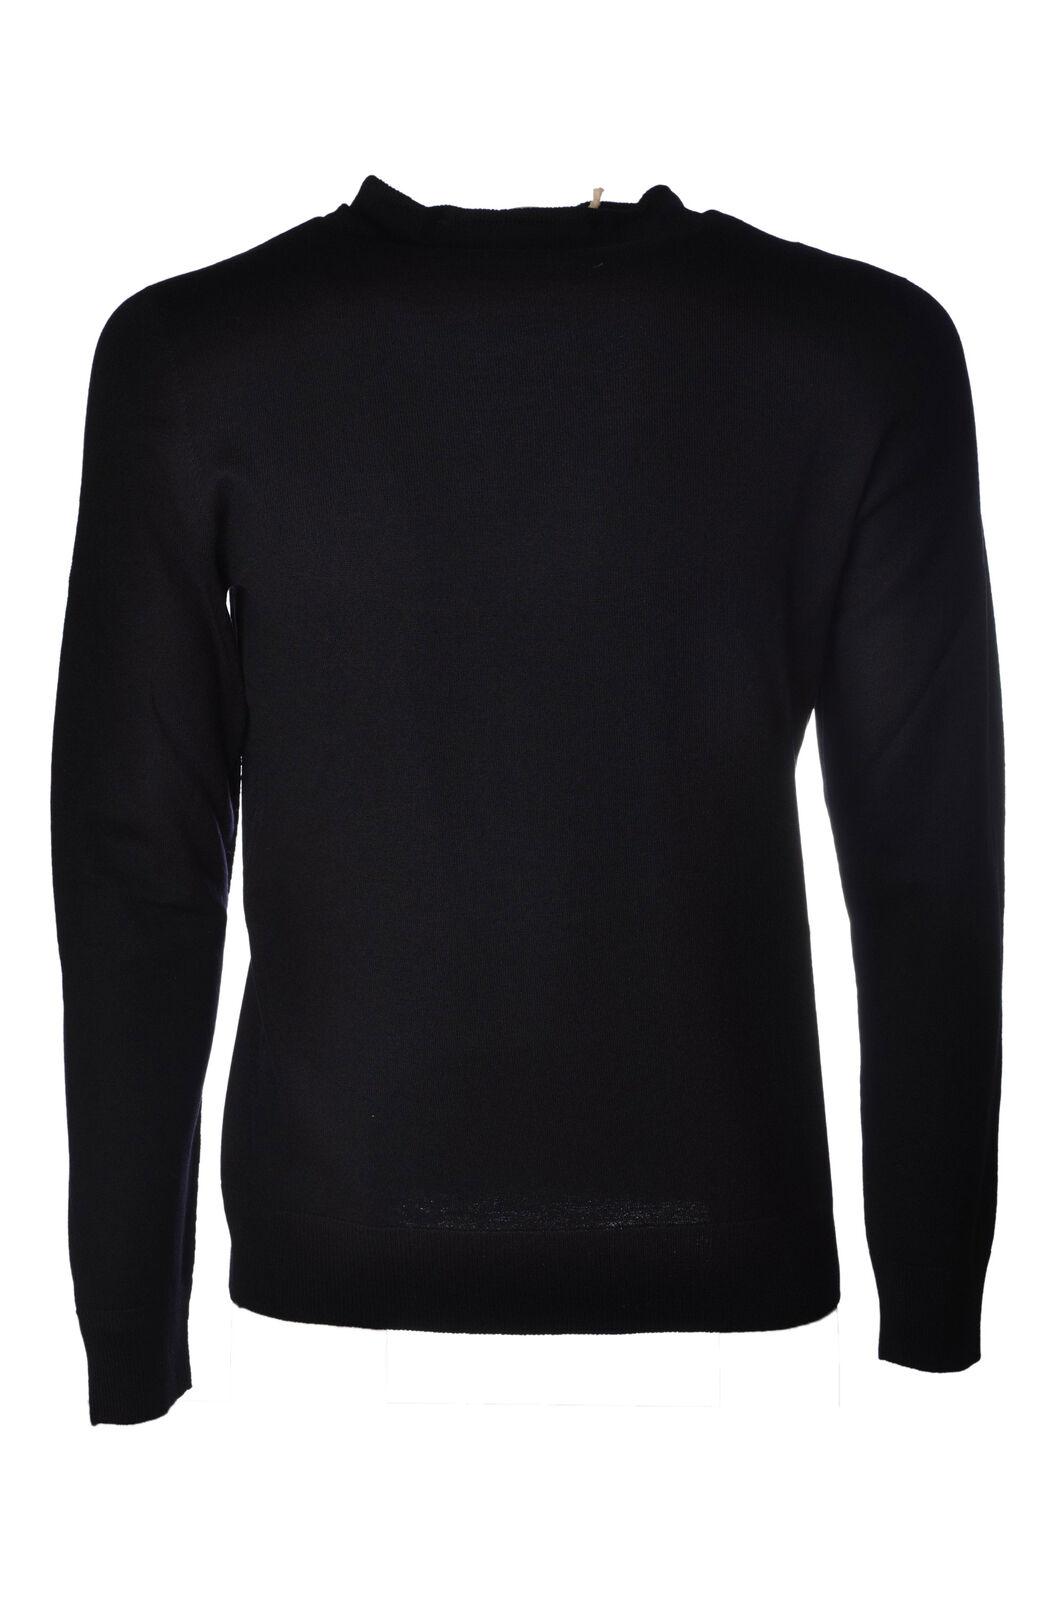 LA FILERIA - Knitwear-schweißers - Man - Blau - 4023808C191351